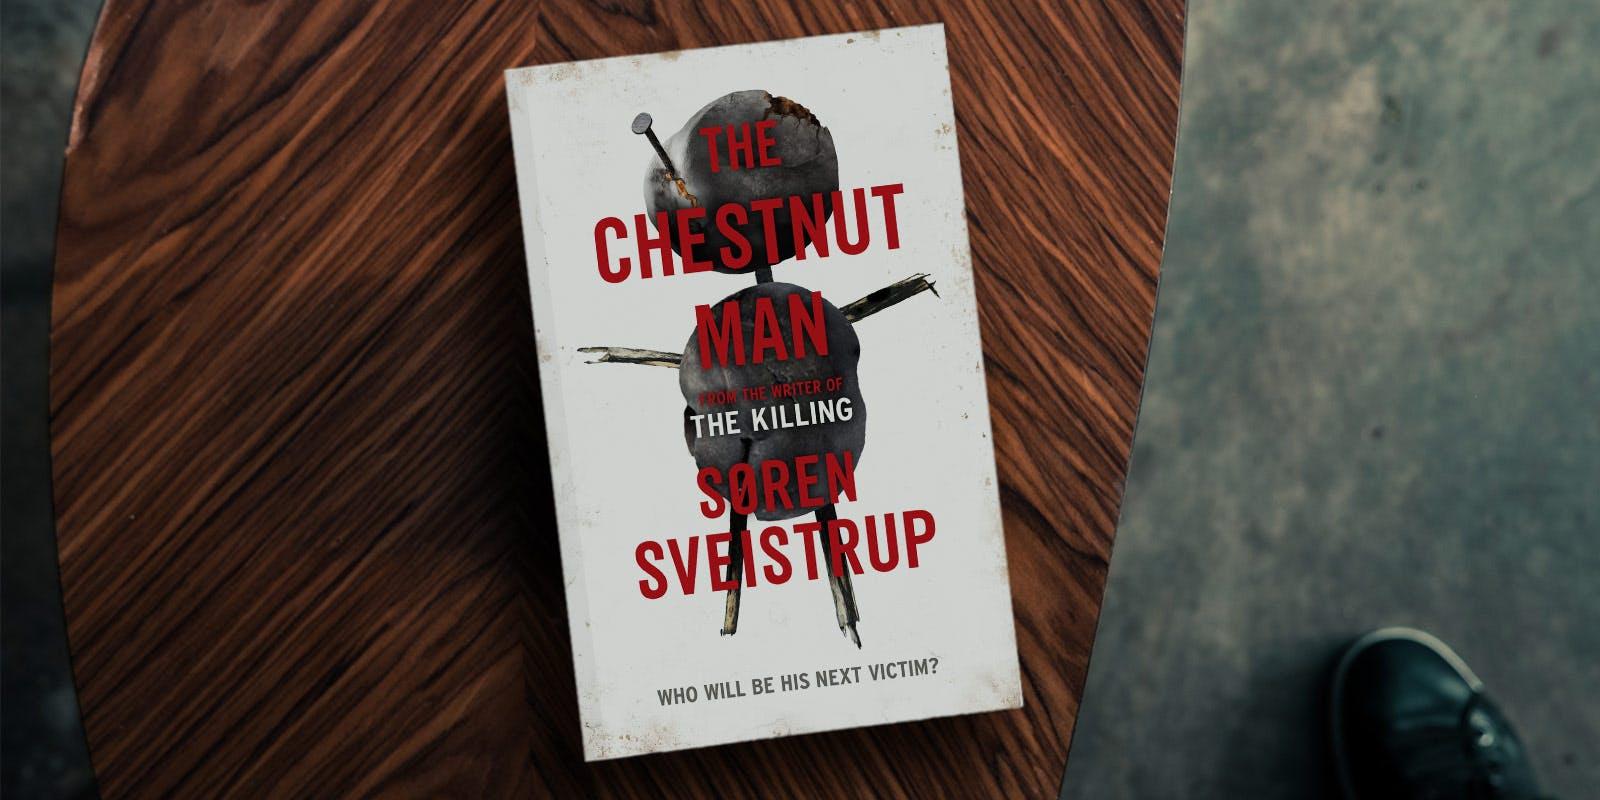 The Chestnut Man to become Netflix Original series